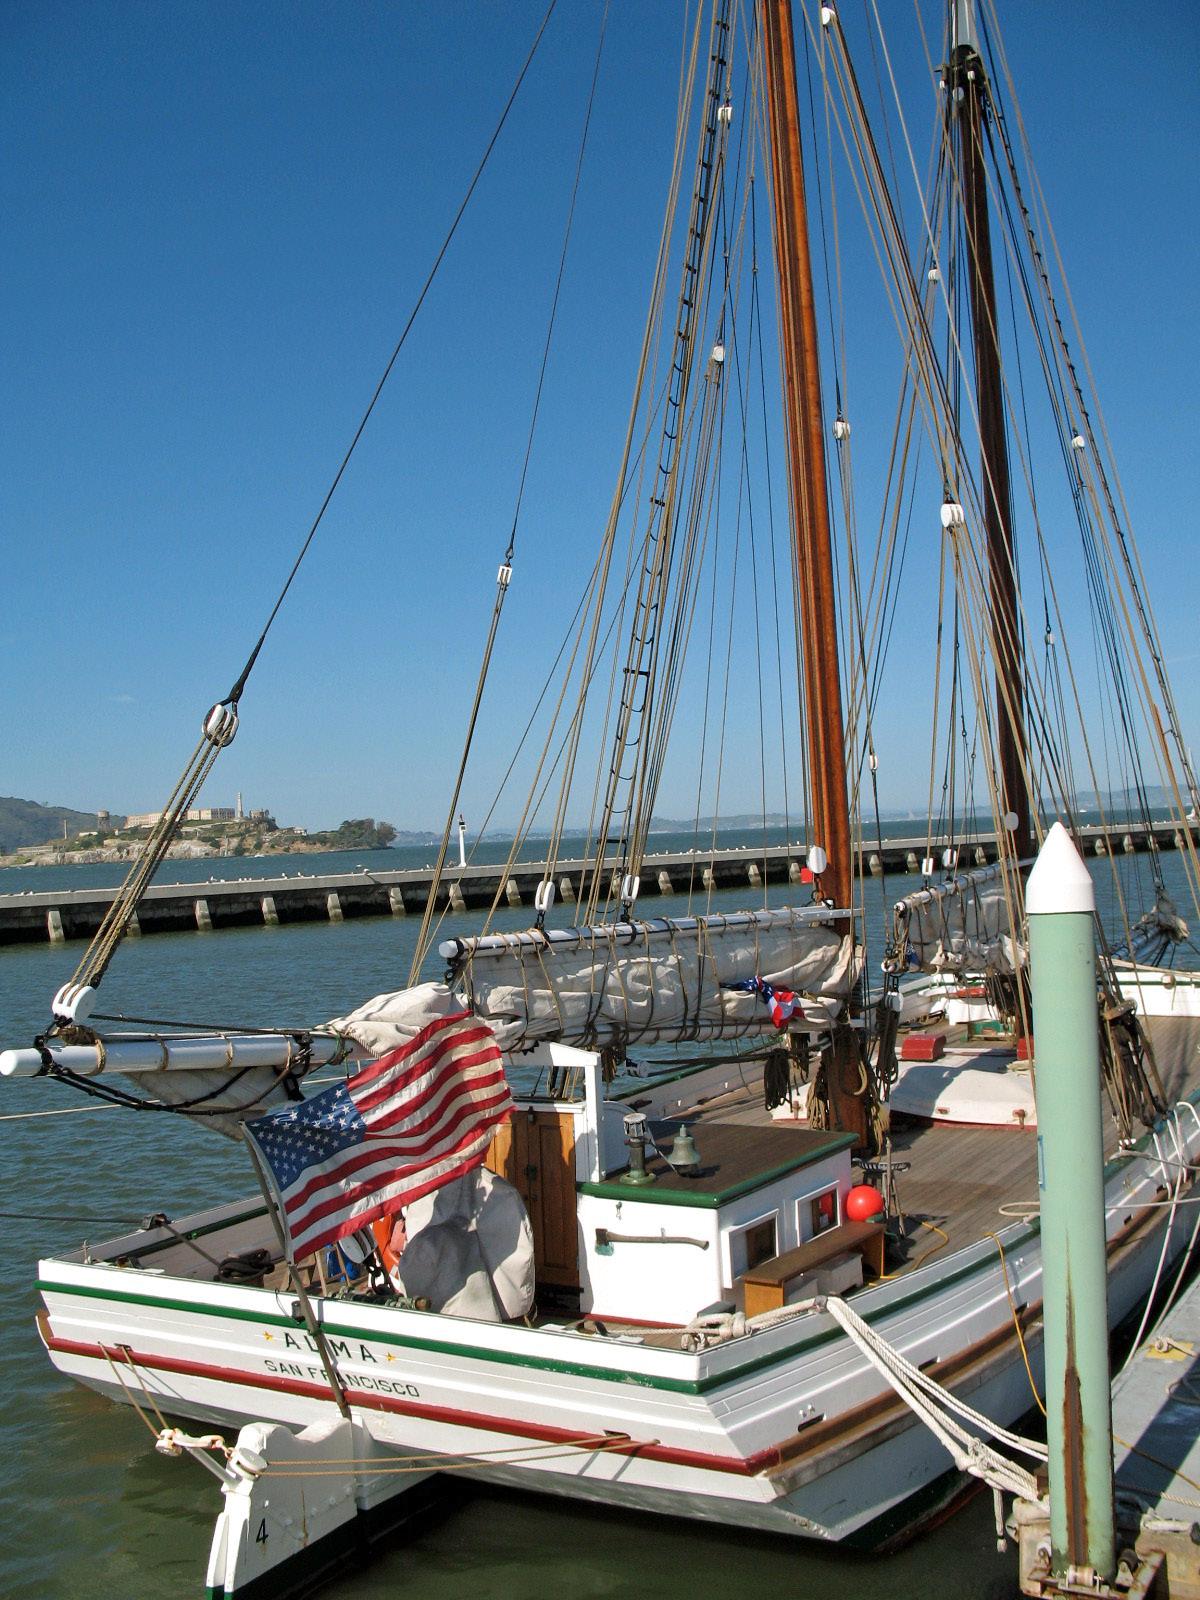 File:Alma (scow schooner, San Francisco) 1.JPG - Wikimedia ...